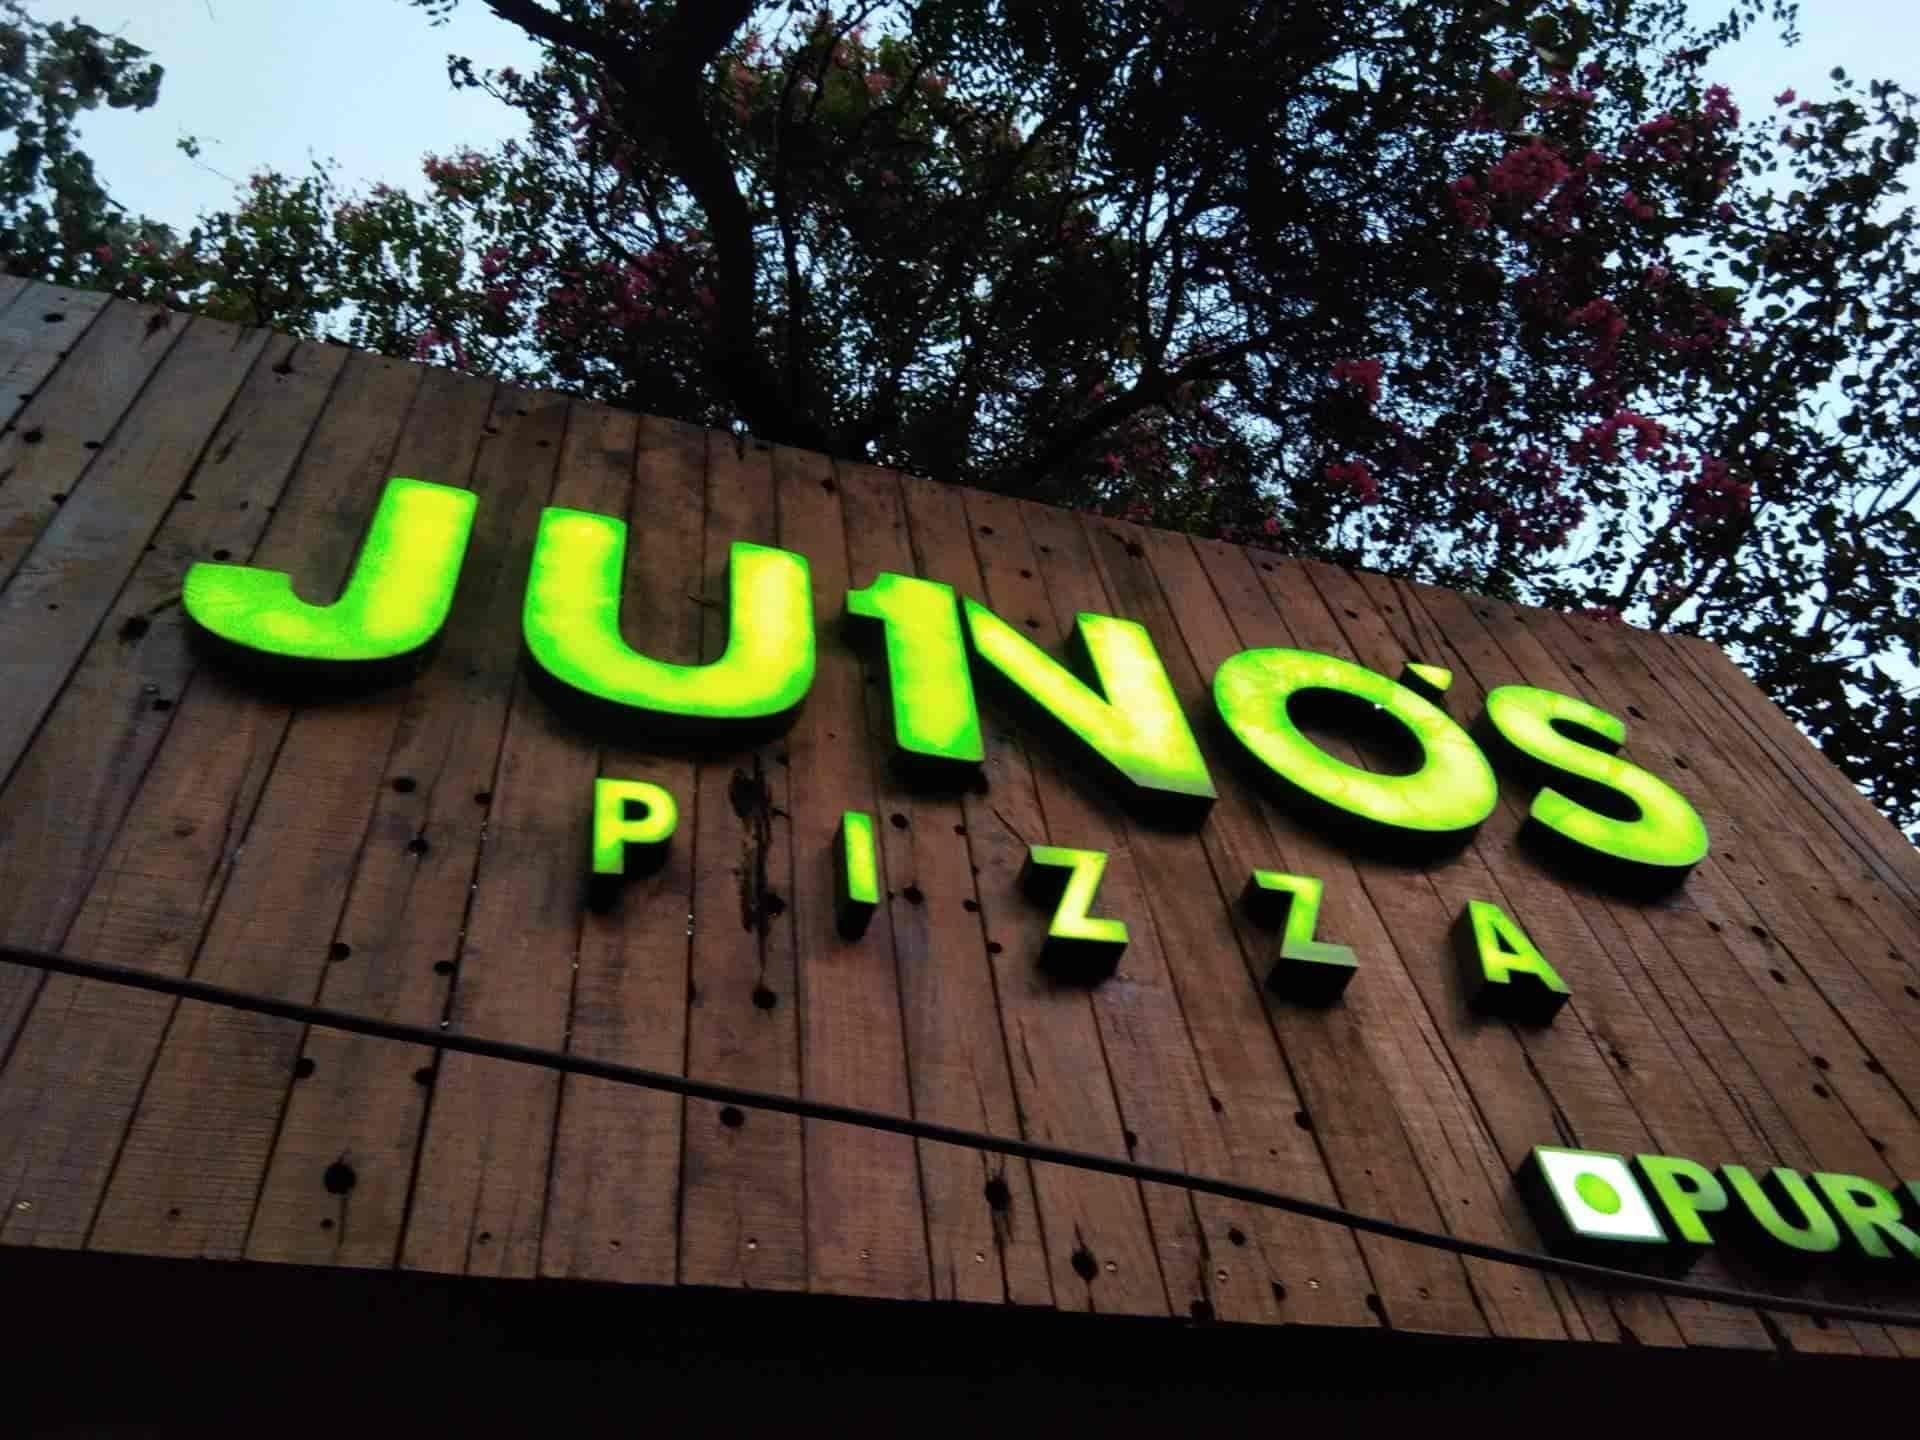 Juno's Pizza, Vile Parle West, Mumbai - Pizza Cuisine